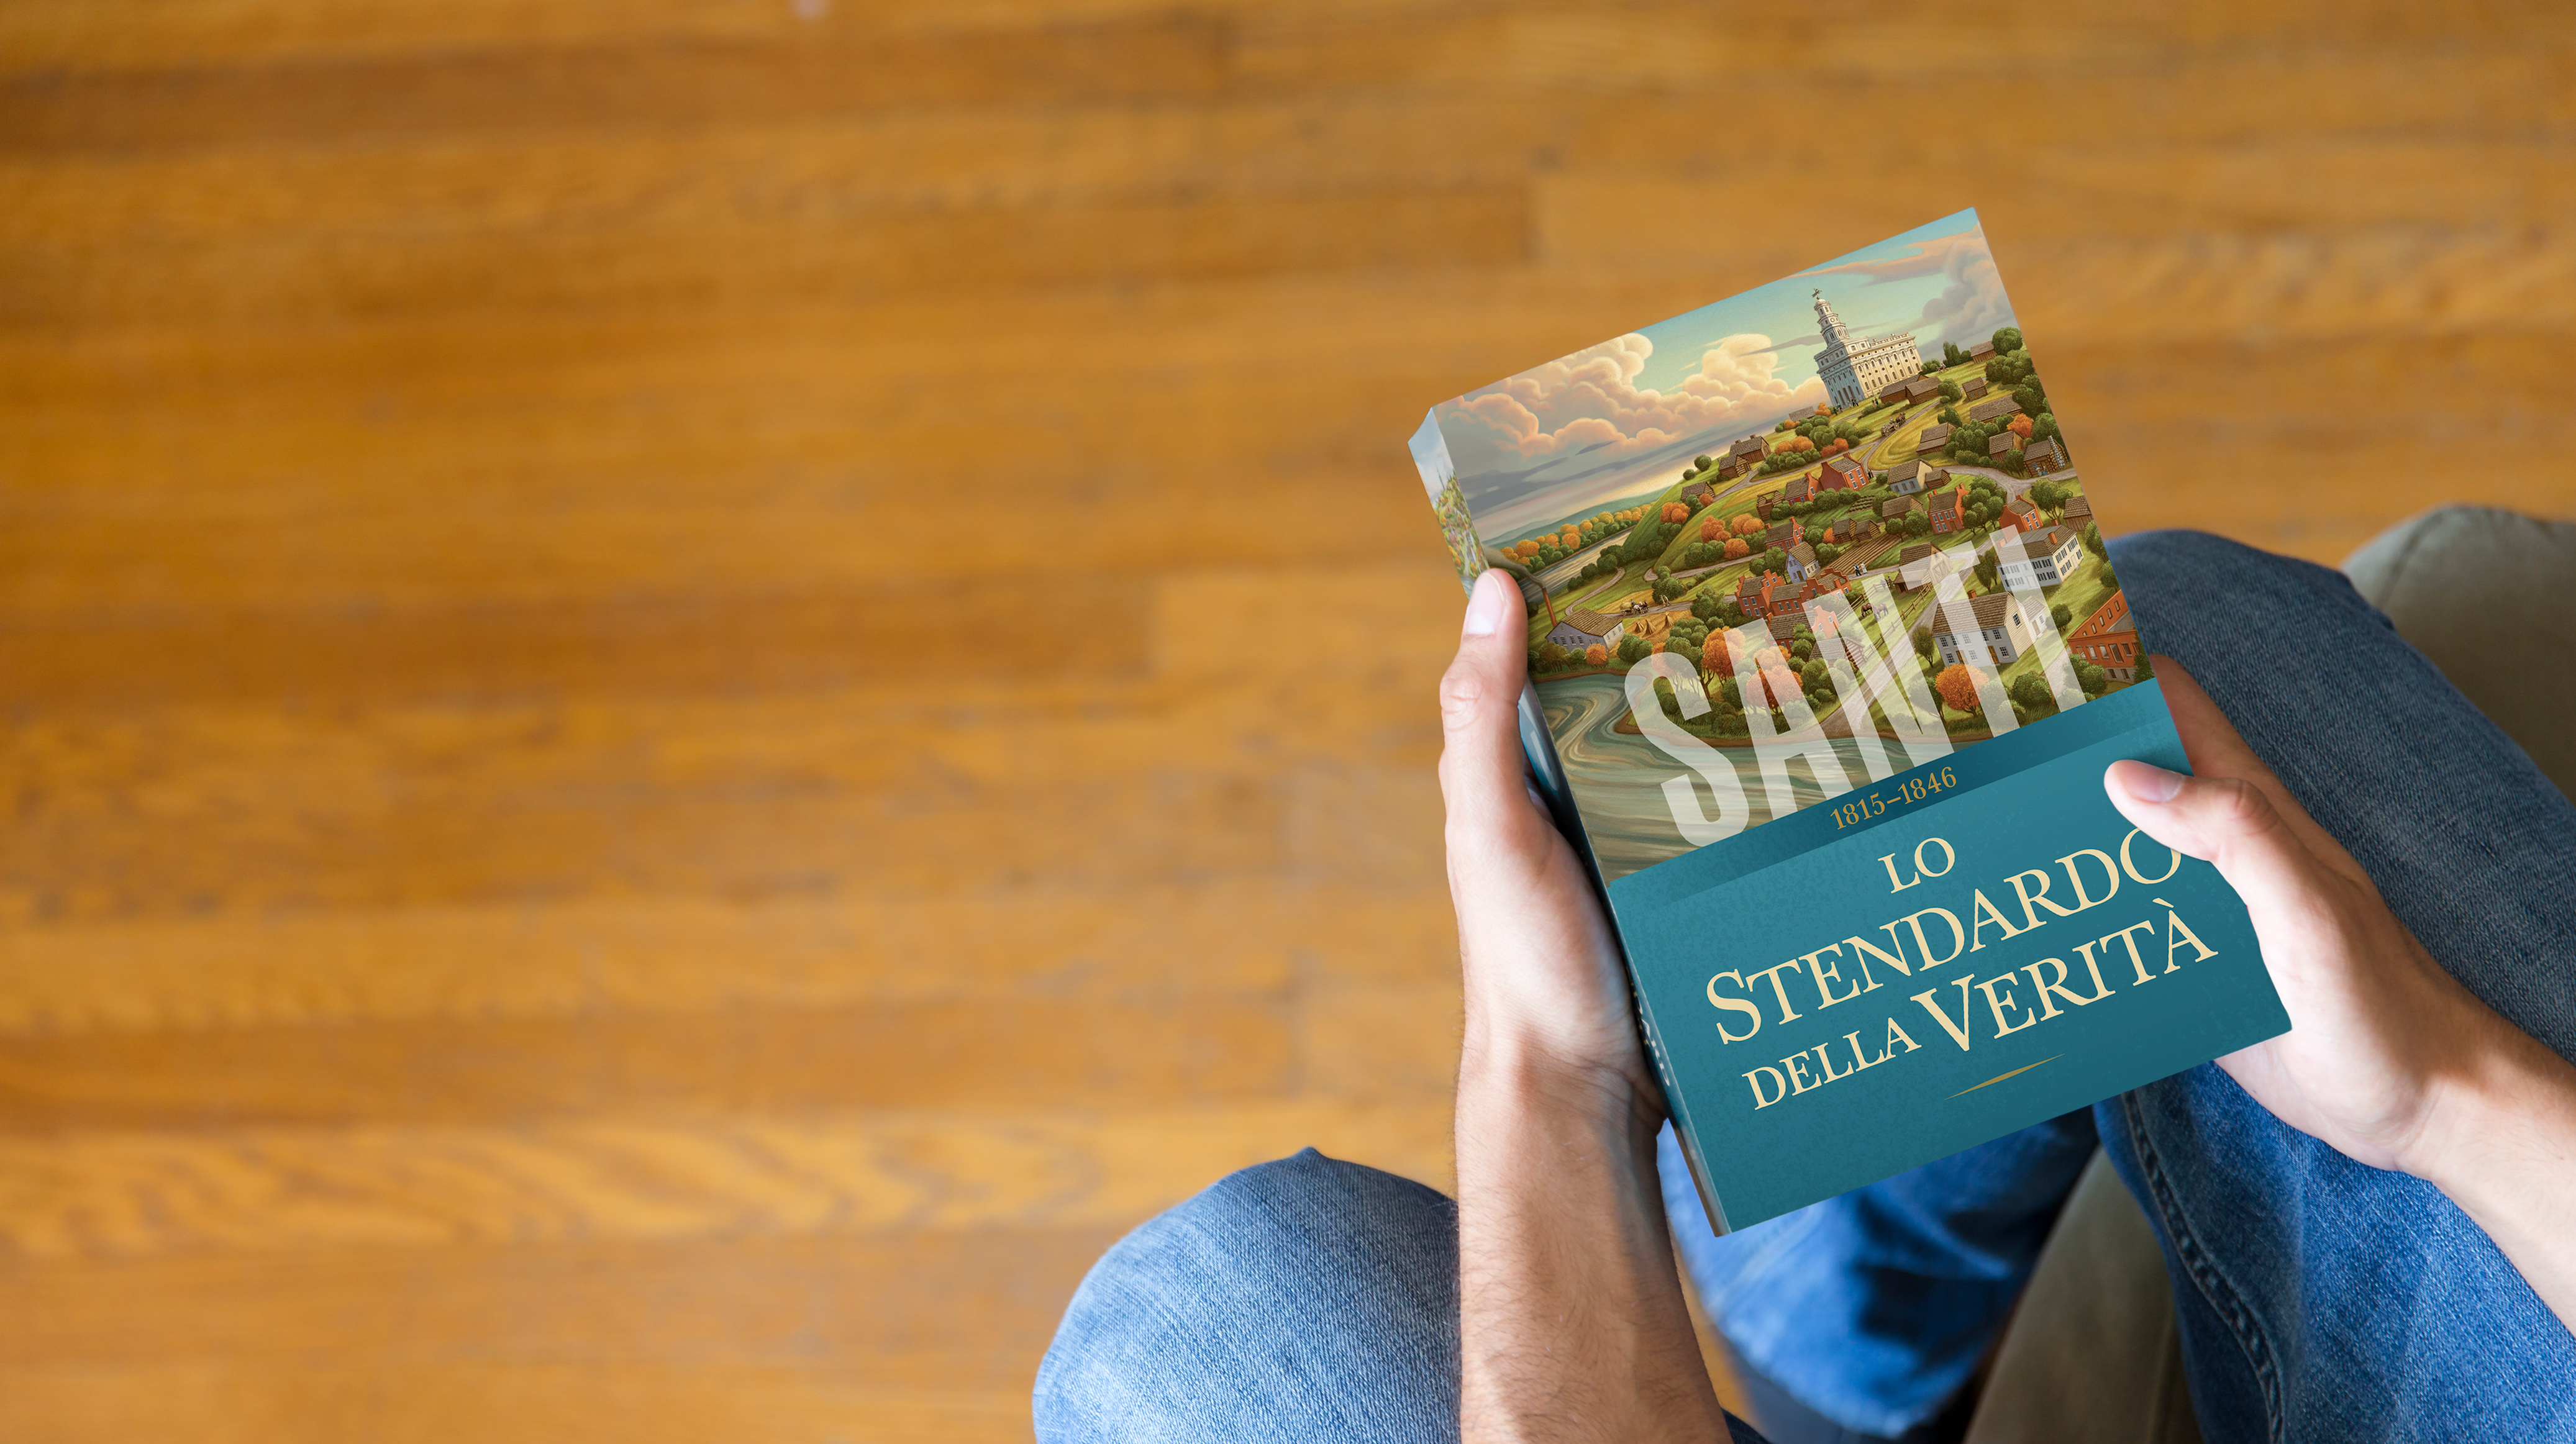 Santi, Volume 1